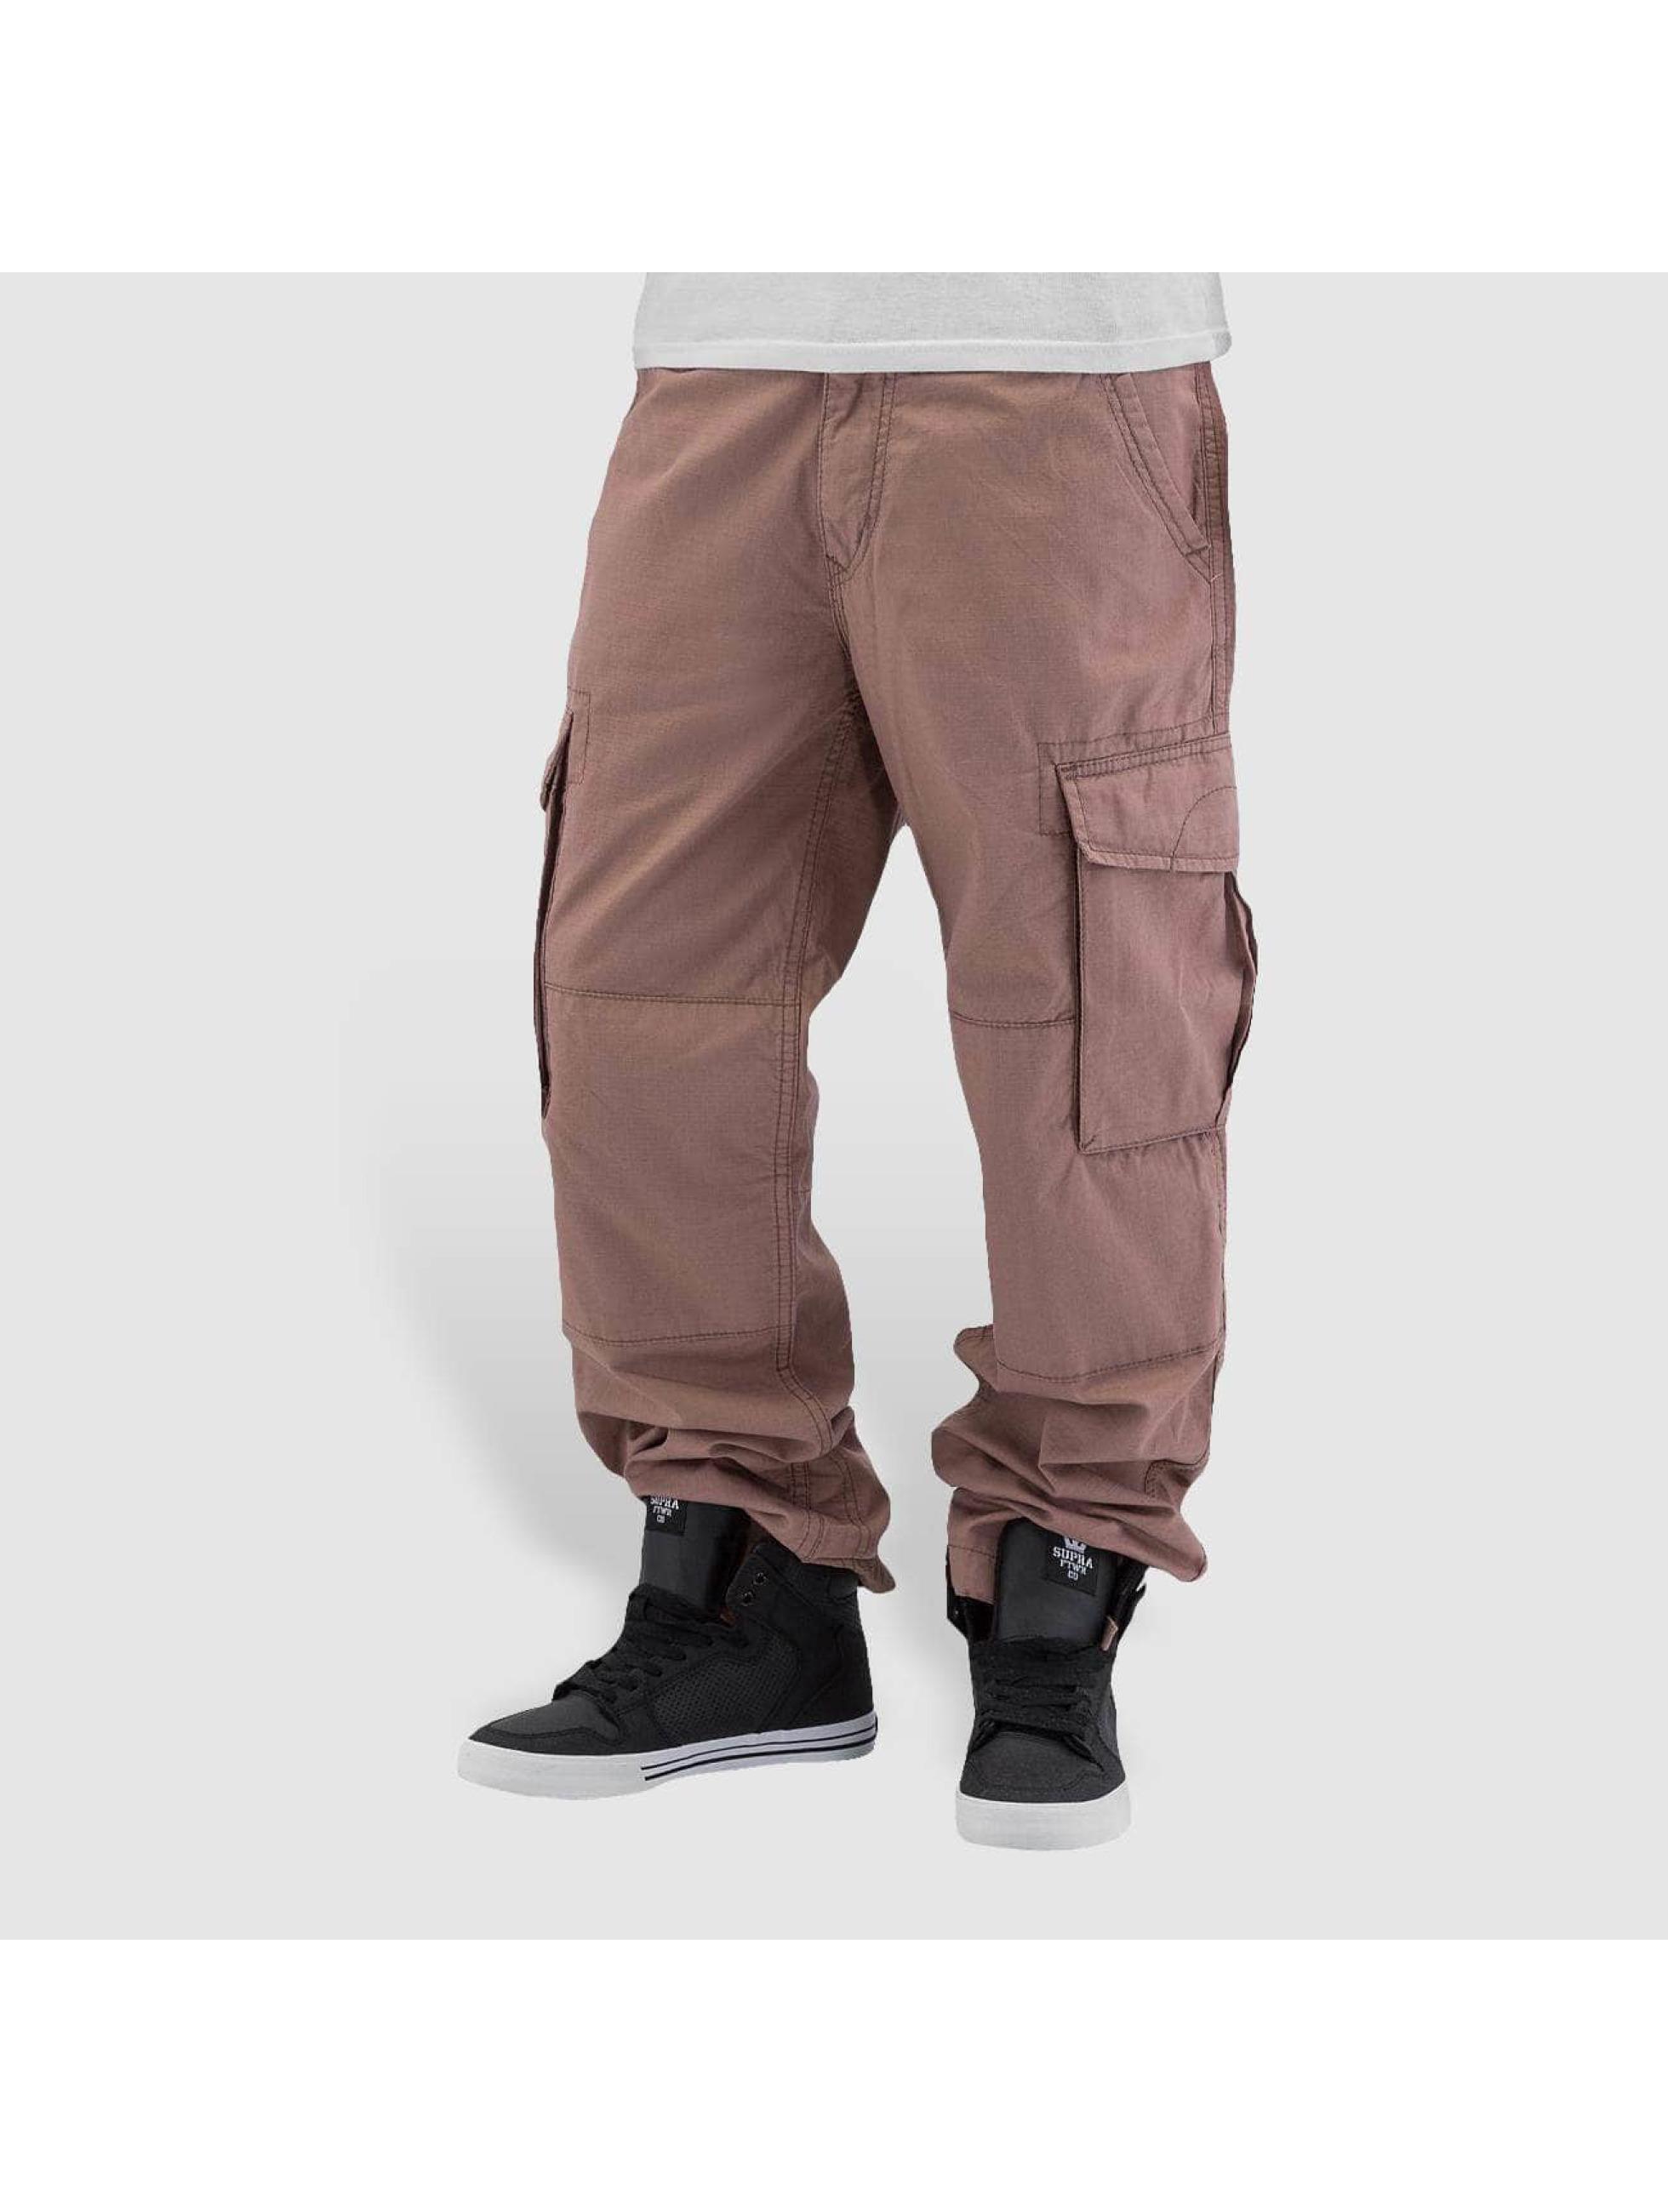 reell jeans herren cargohose ripstop in beige 203075. Black Bedroom Furniture Sets. Home Design Ideas